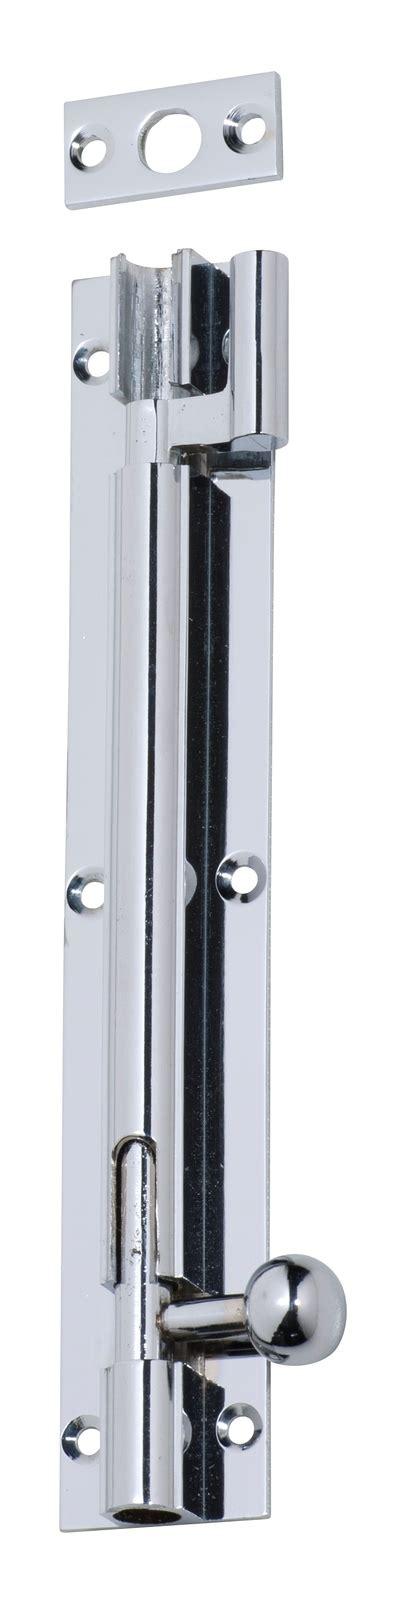 tradco  barrel bolt offset chrome plate xmmfree shipping scl locks keeler hardware